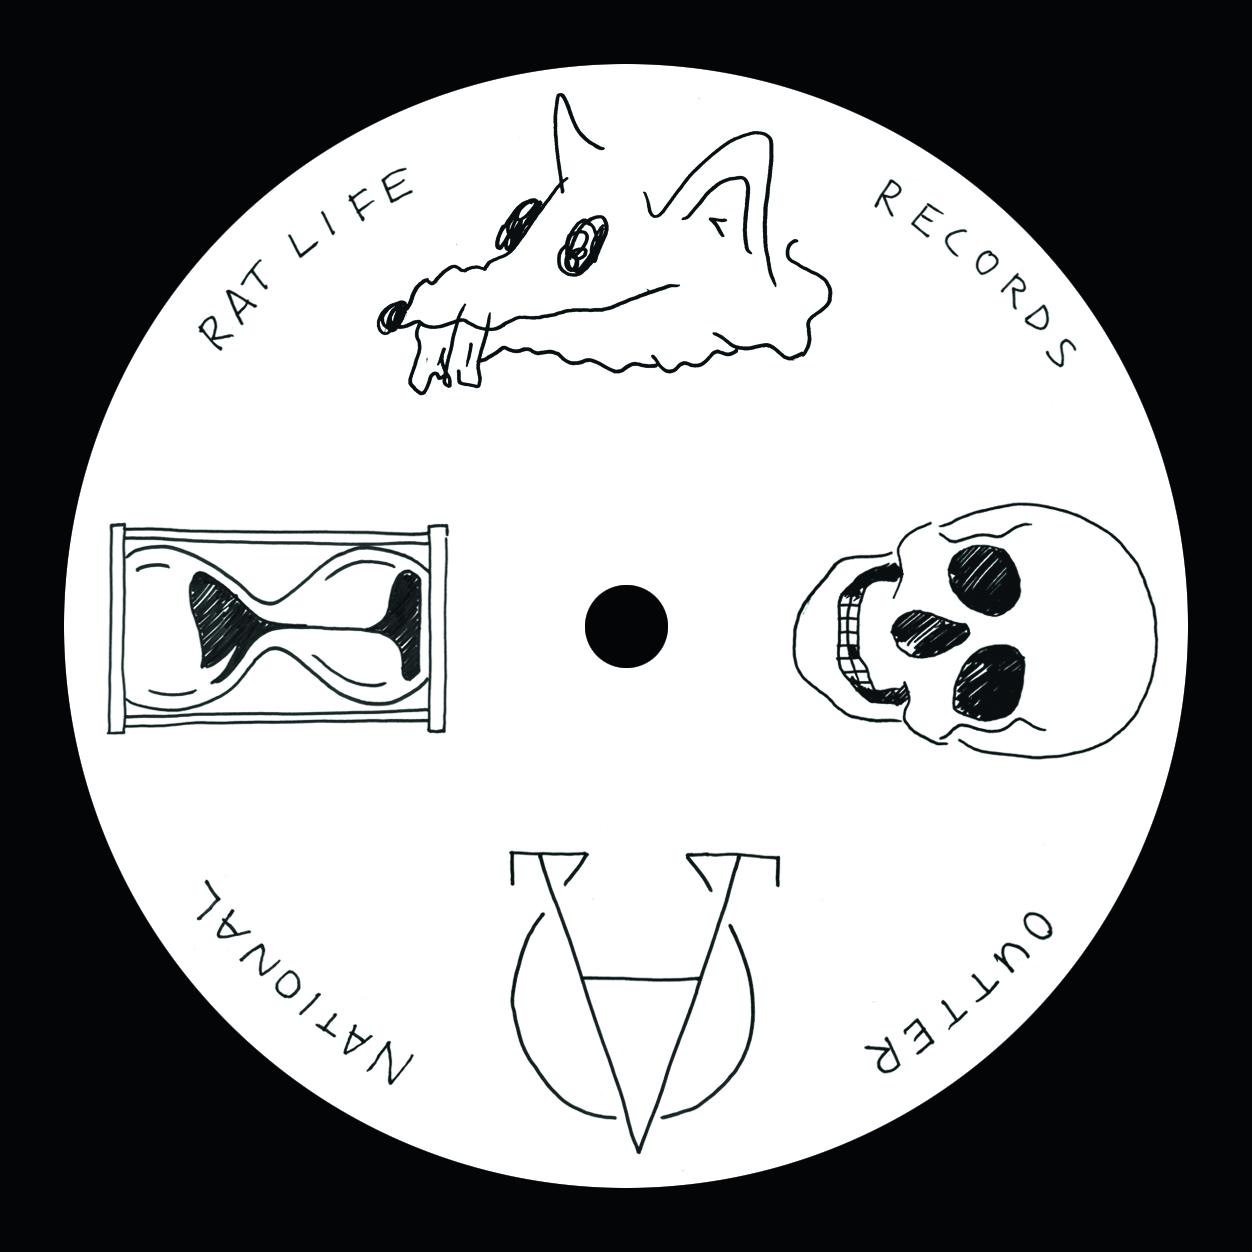 Konstantin Tschechow – Alpha Omega [Rat Life Records] (2016)